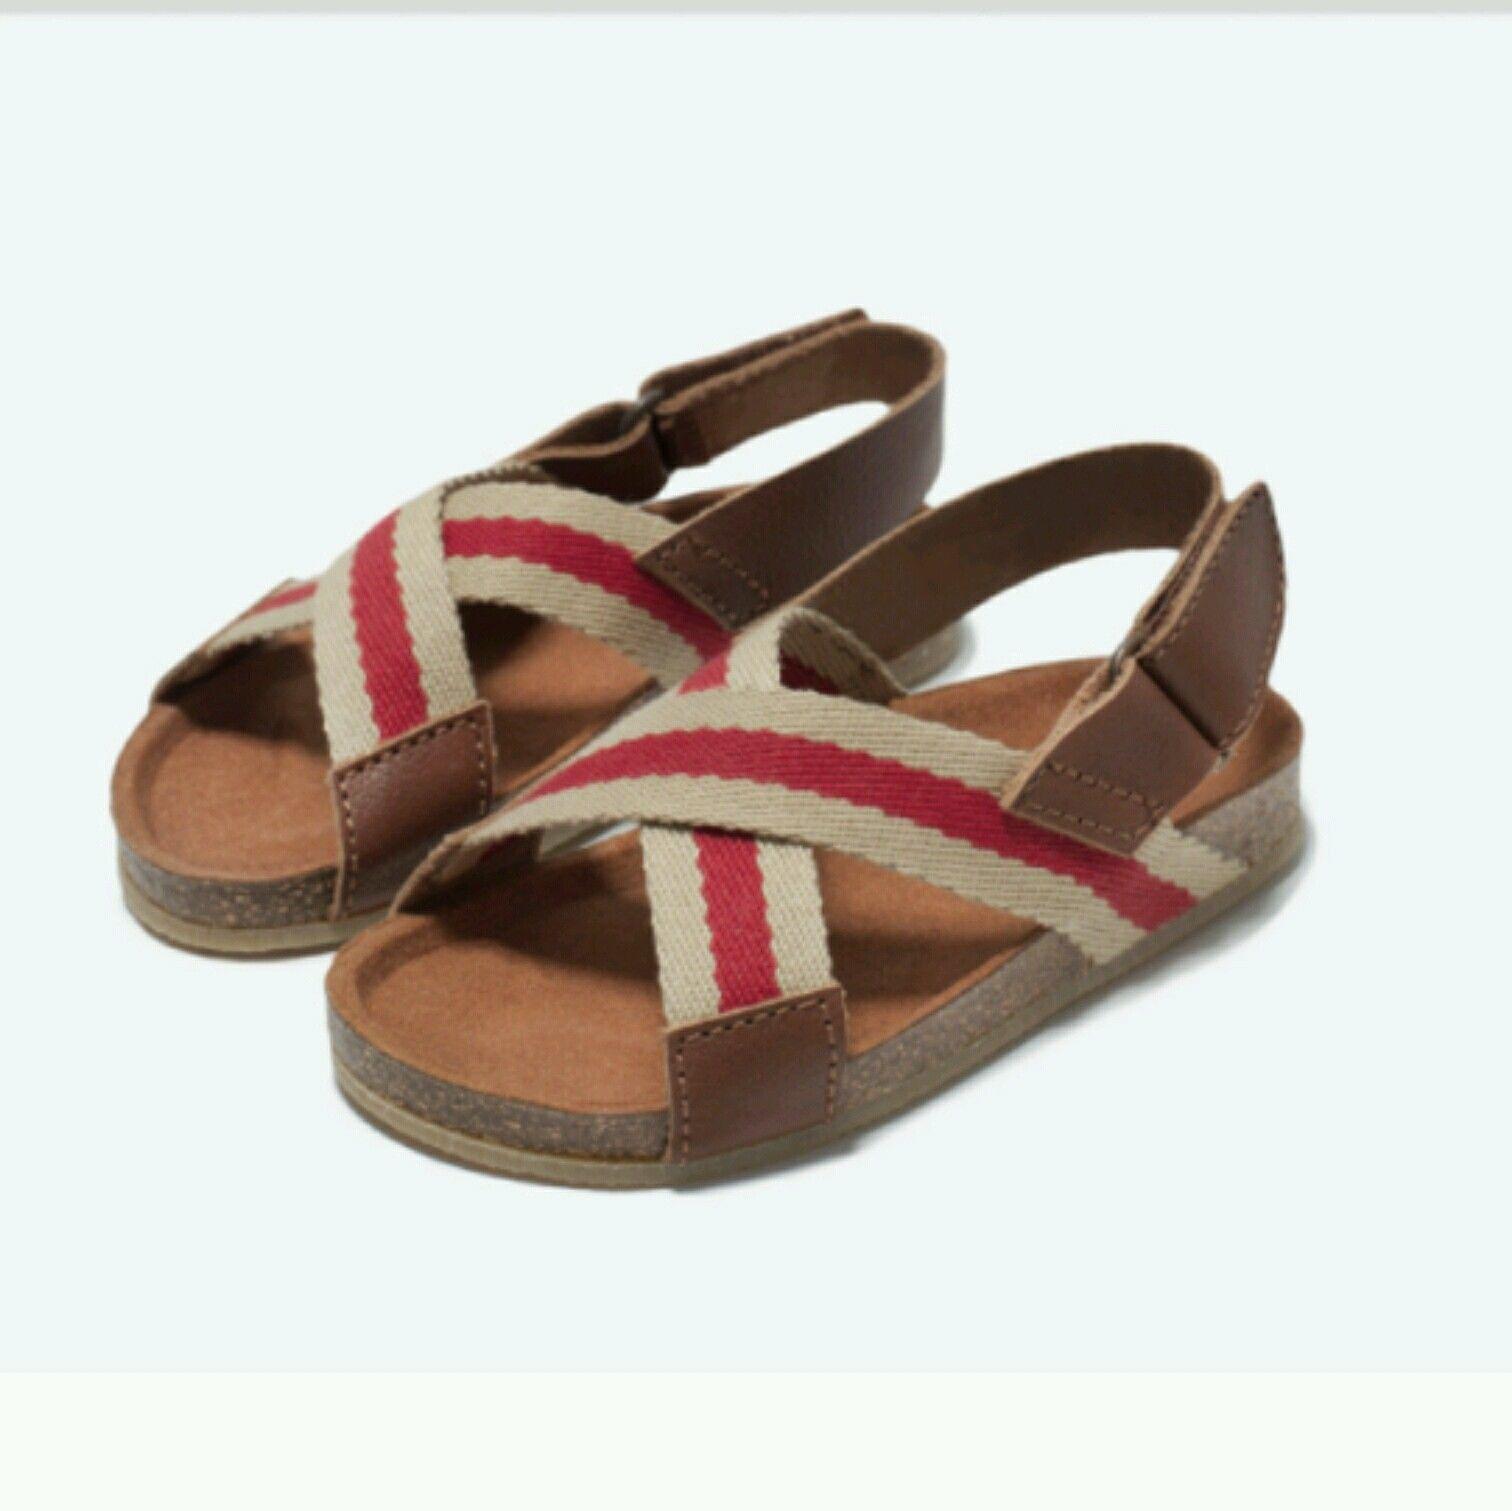 Zara baby boy sandals shoes size 2 US